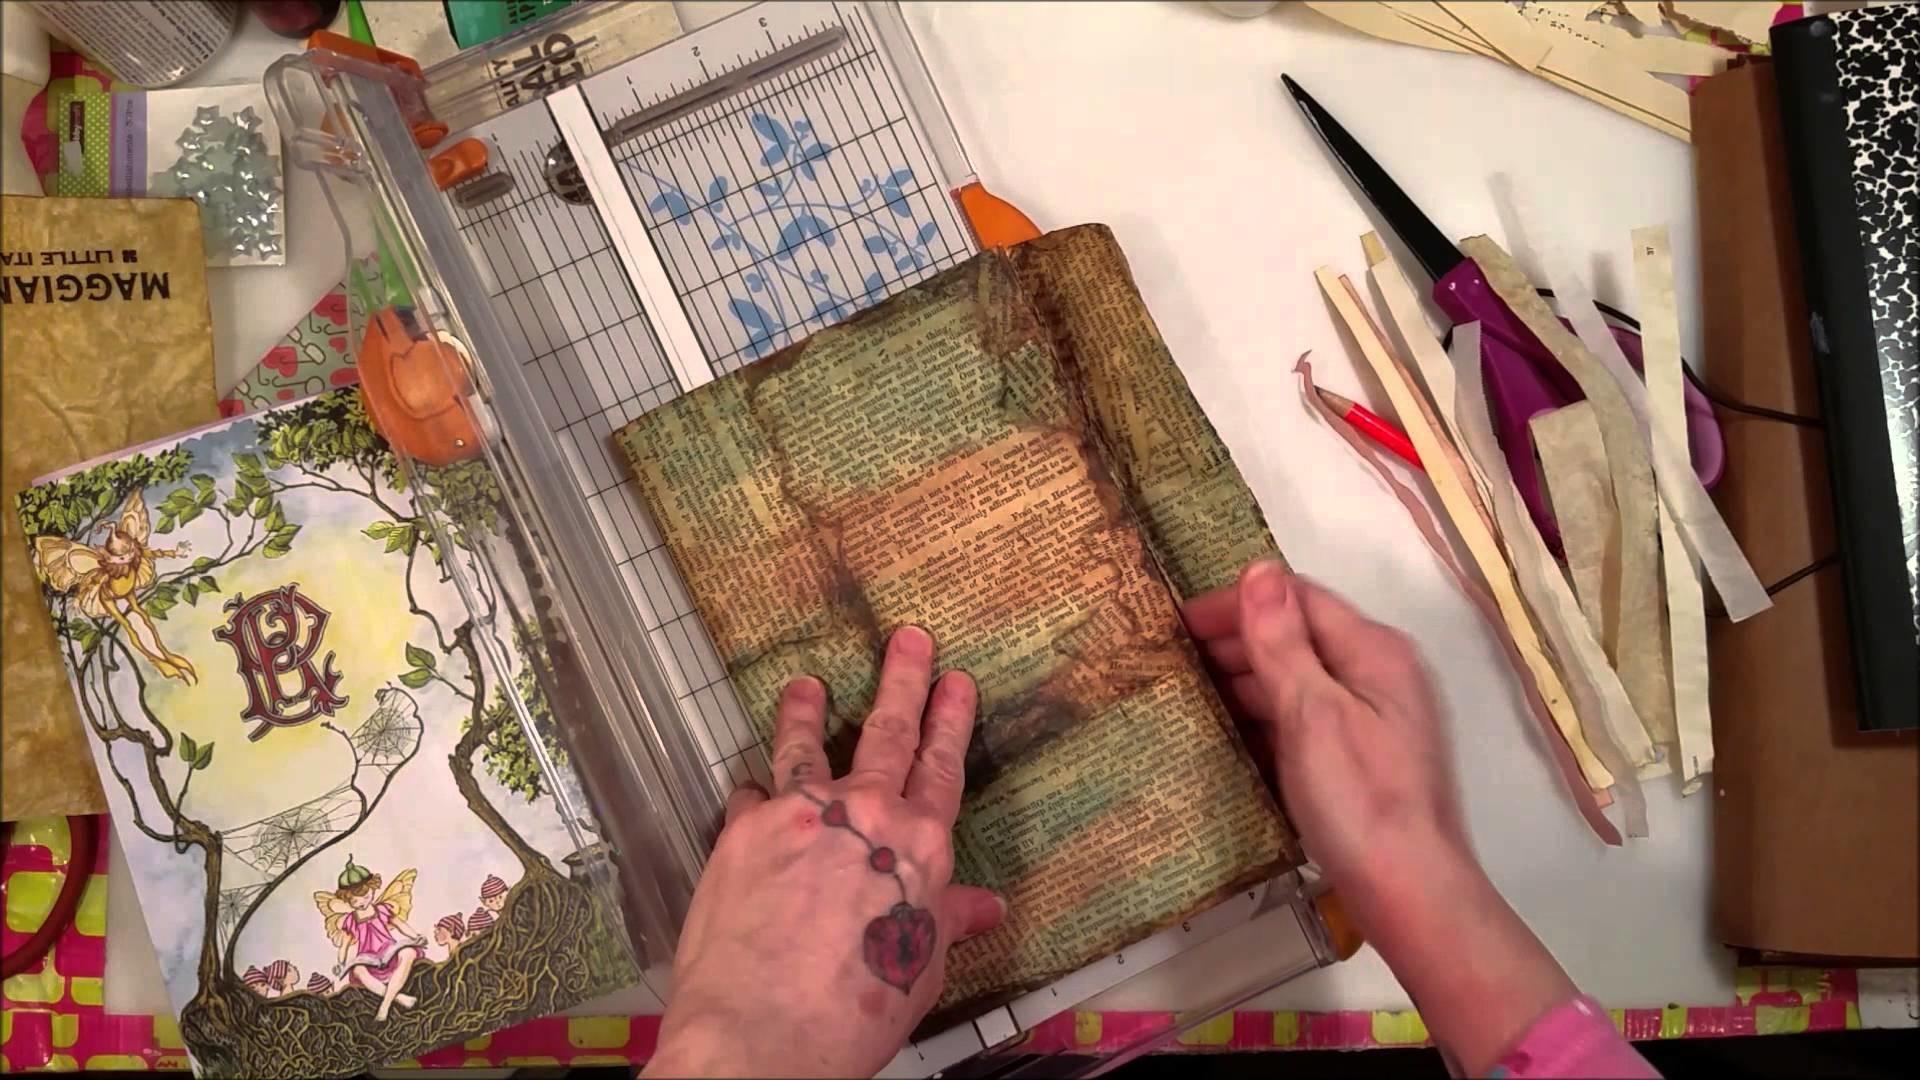 Tutorial: Making a Vintage Envelope Junk Journal - Part 2: The Signatures